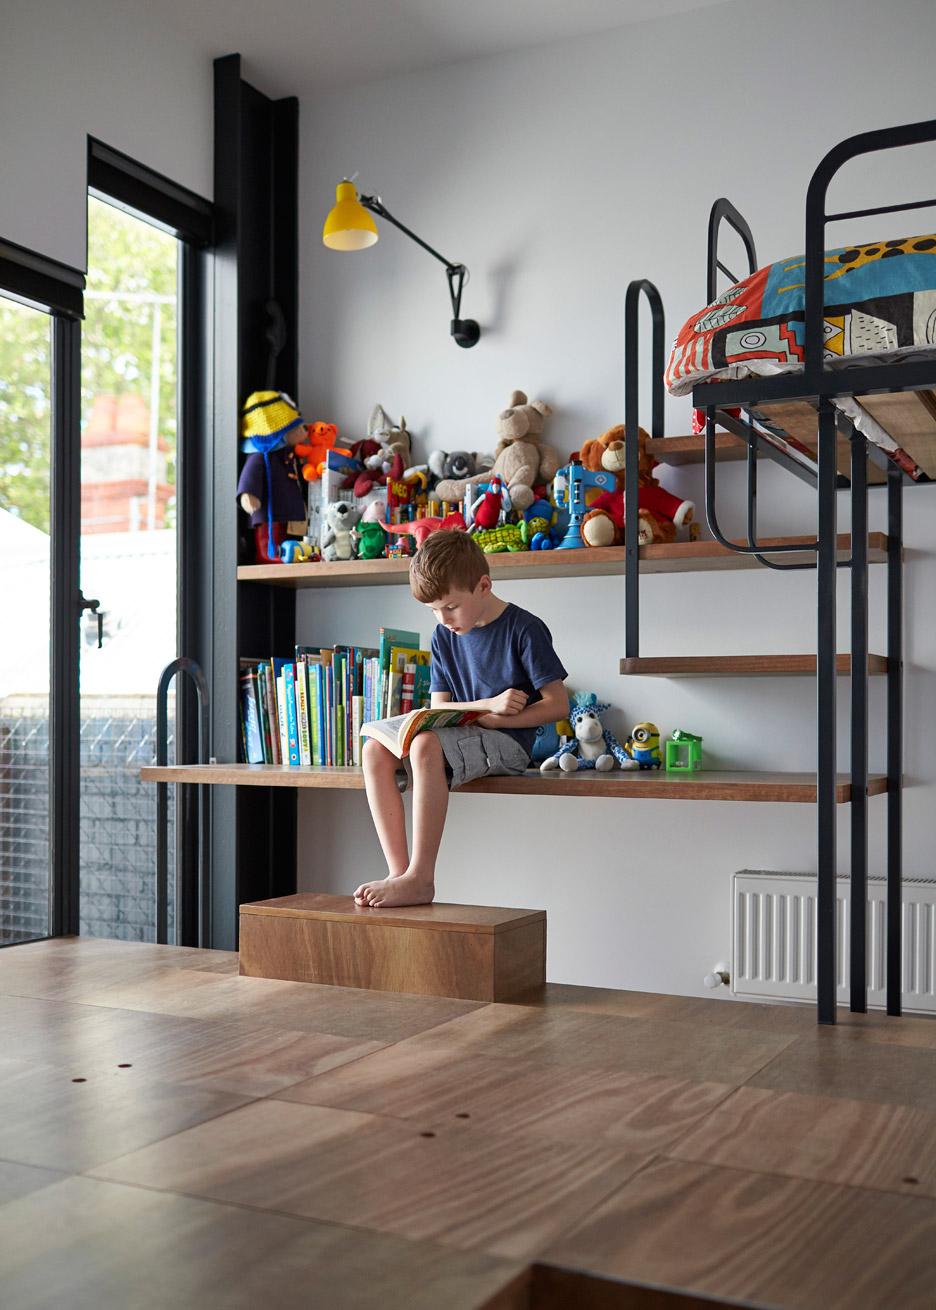 Mills toy management house by Austin Maynard